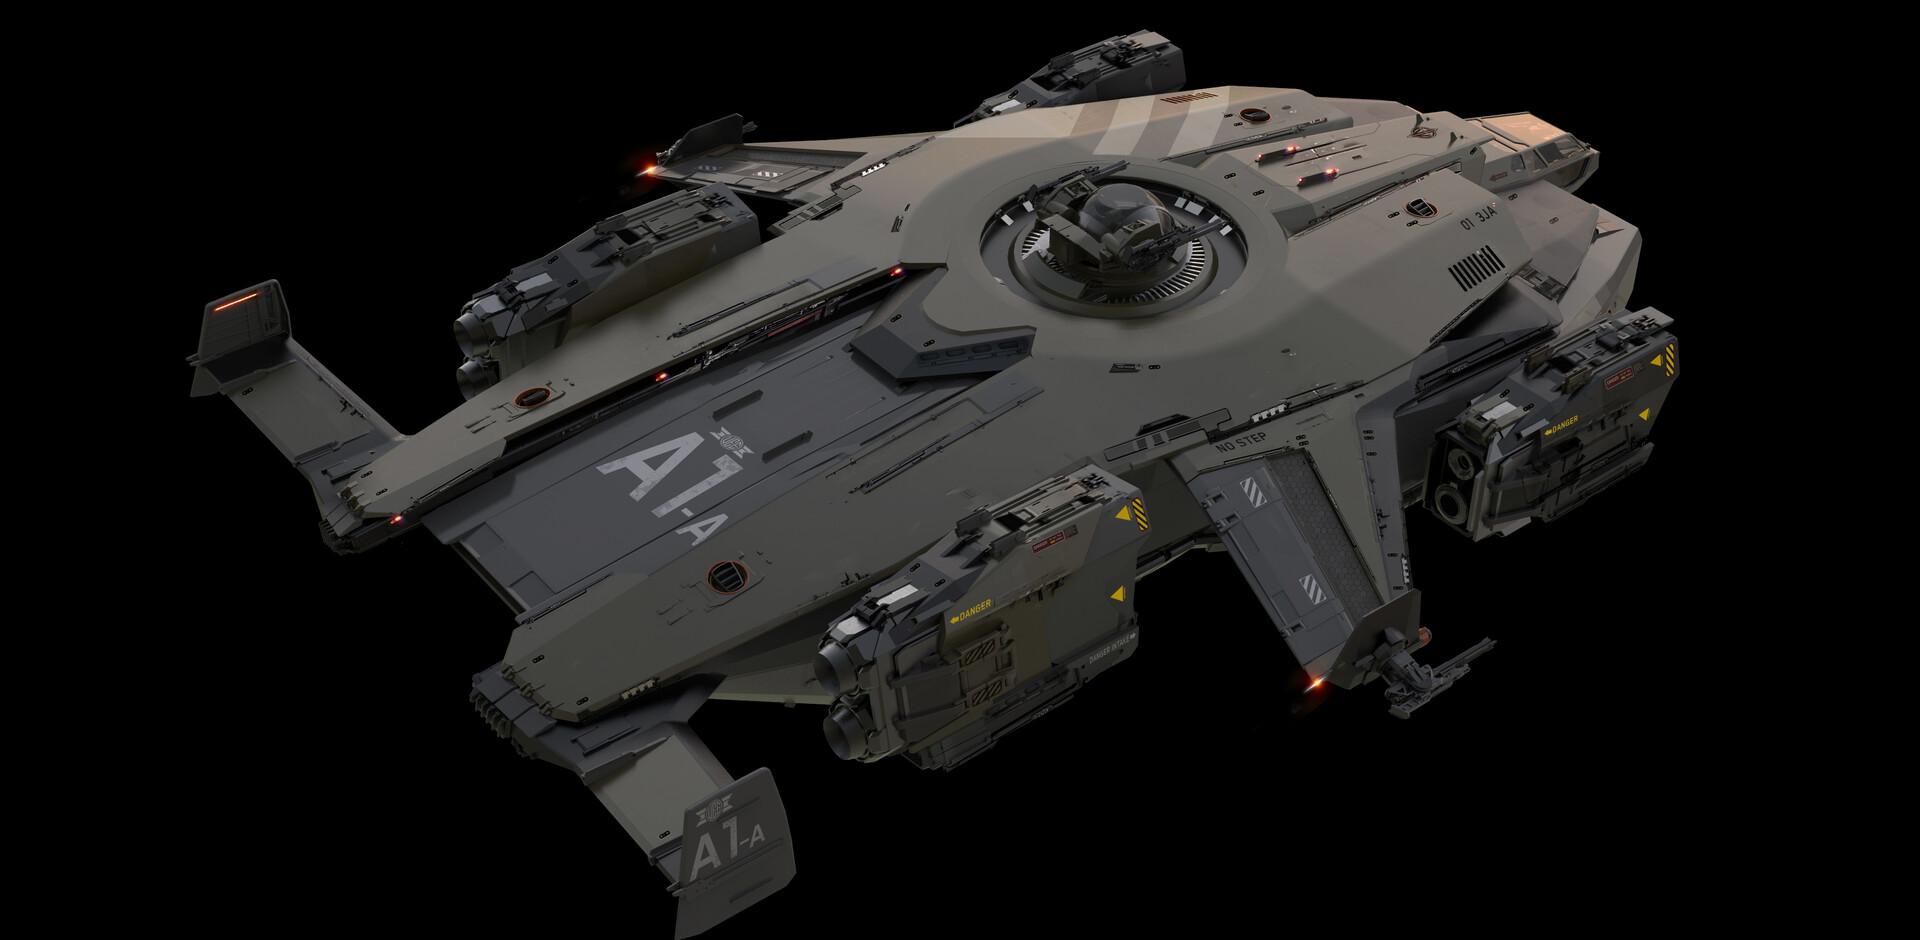 (Valkyrie Photo Courtesy of Anvil Aerospace)